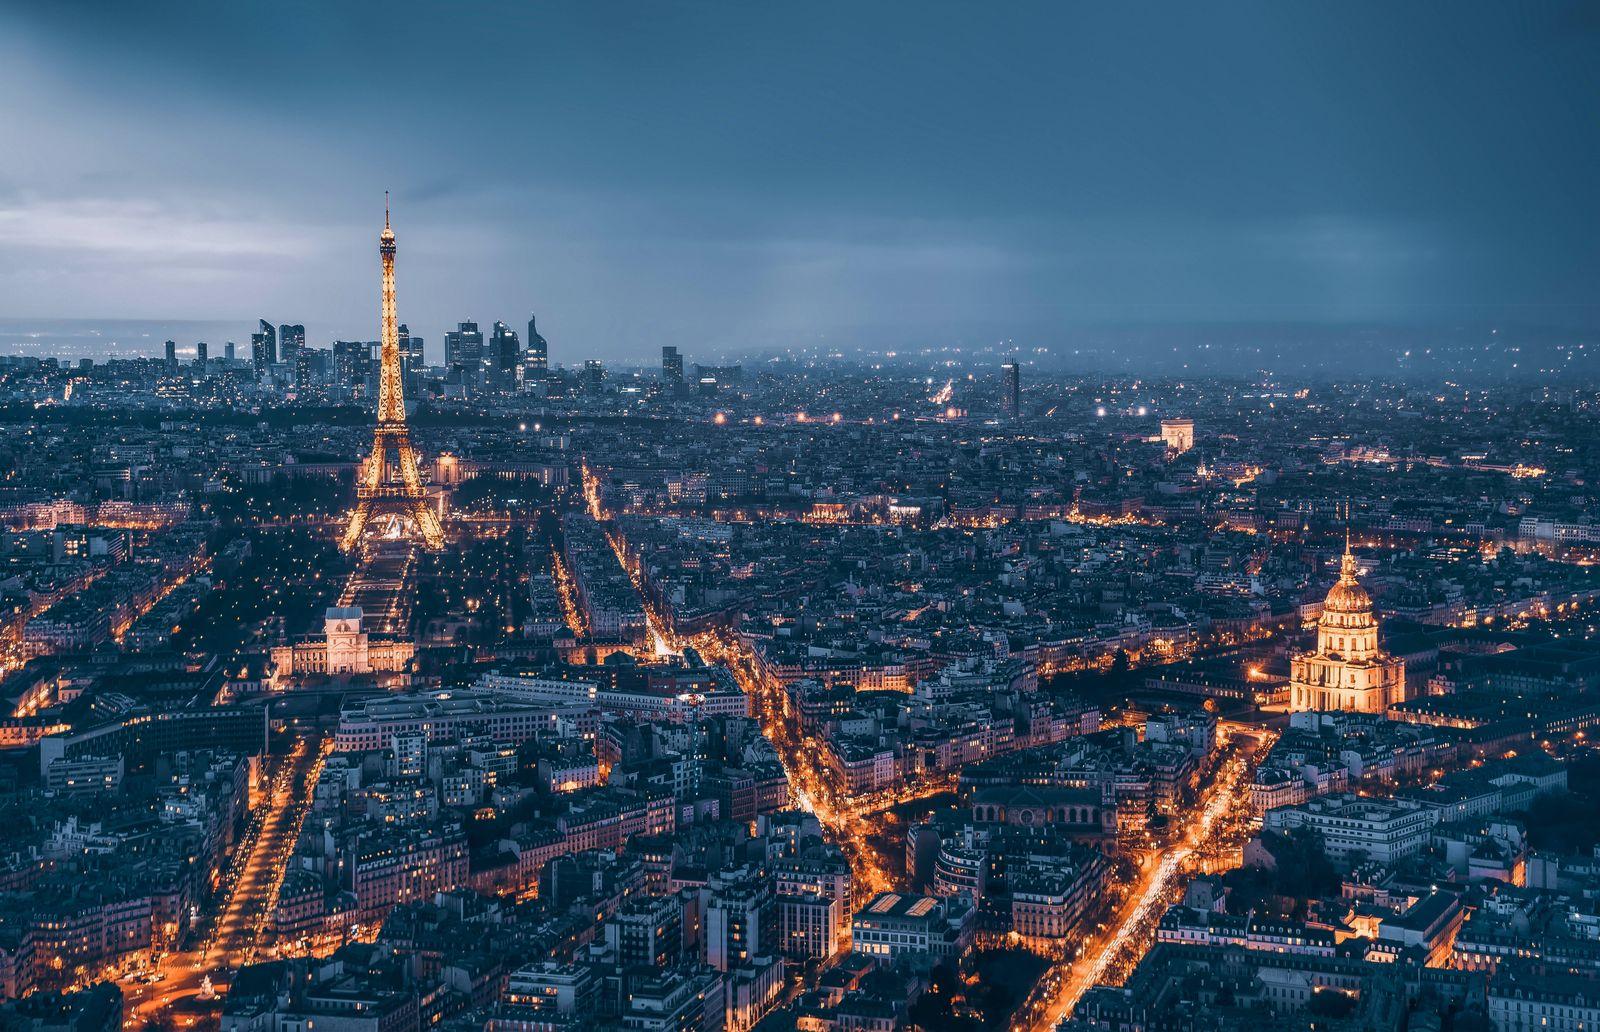 Paris city night view PUBLICATIONxNOTxINxCHN 668334810108002317